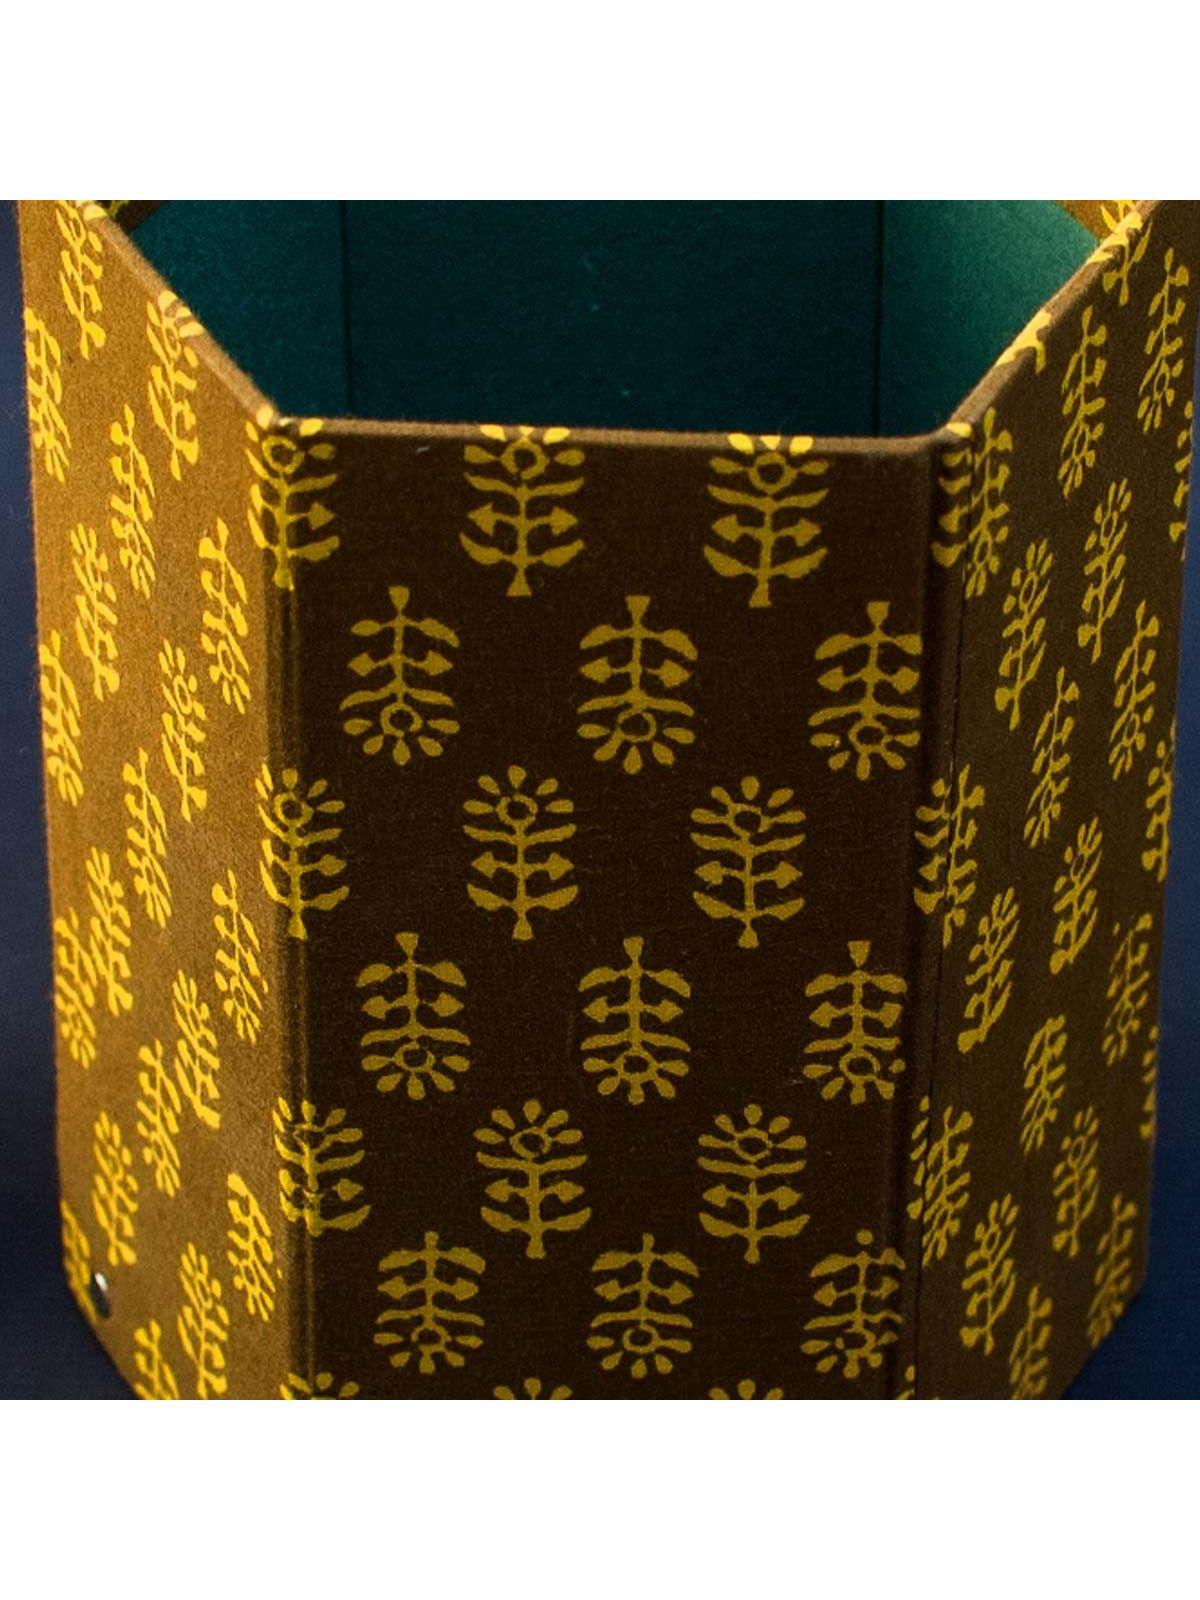 Green Printed Fabric Cover Bin - 8 x 6.5 Inch